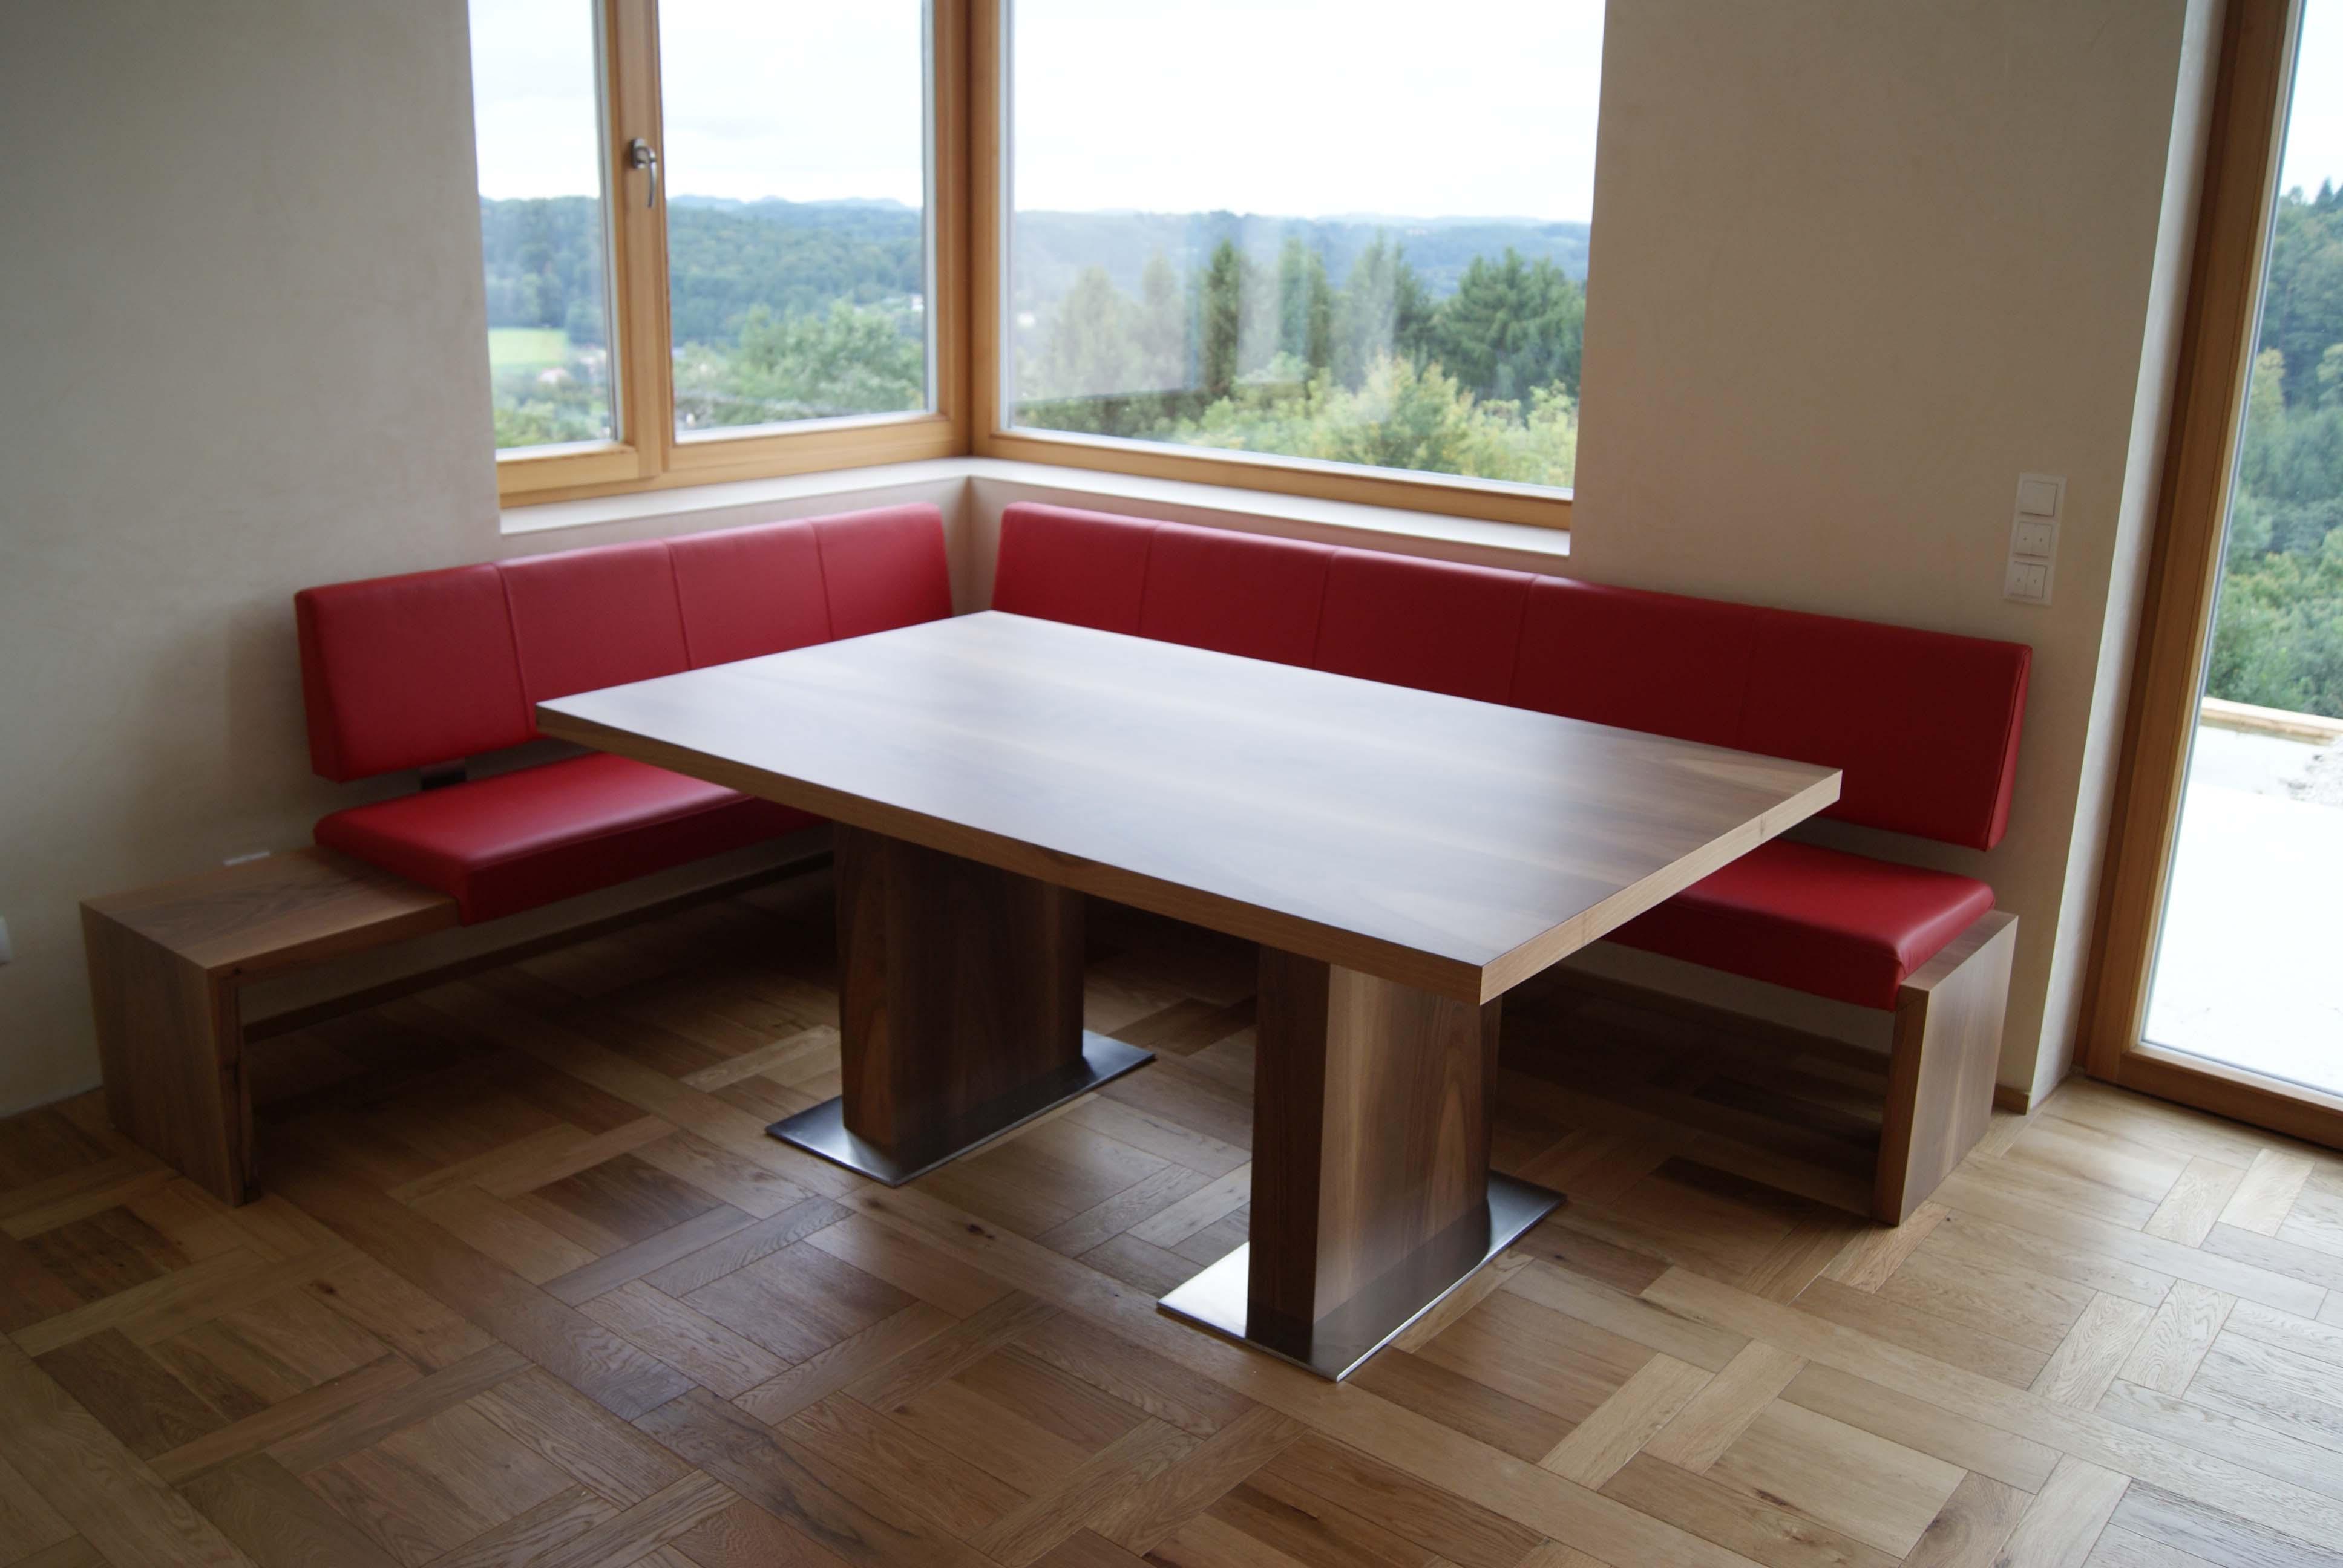 eckbank mit esstisch. Black Bedroom Furniture Sets. Home Design Ideas